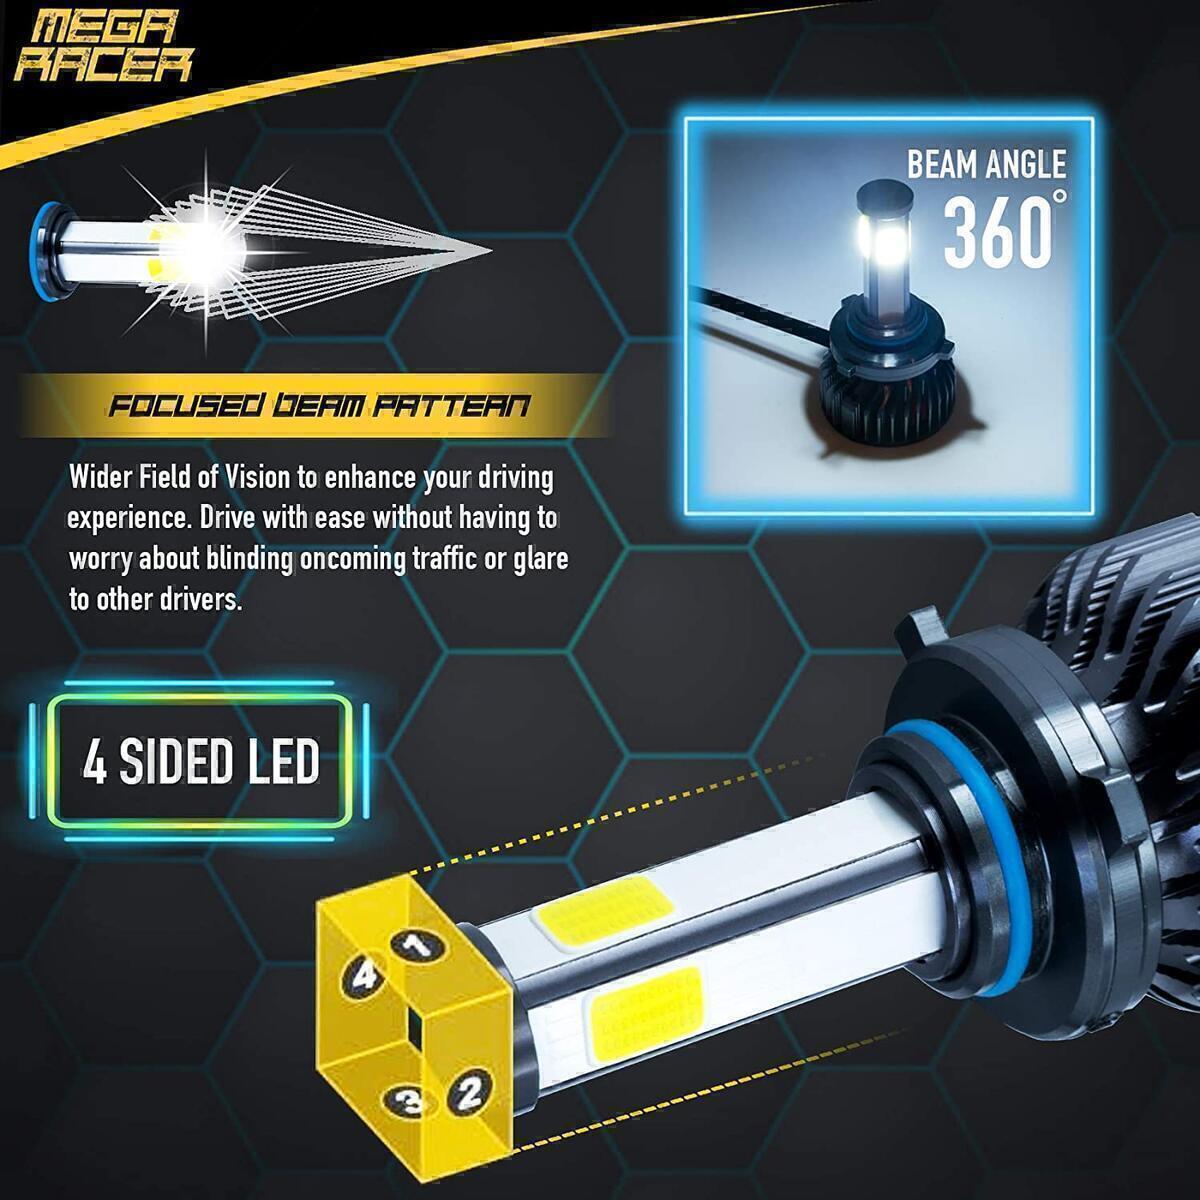 Mega Racer 4 Sided 9005/H10/HB3 LED Headlight Bulbs for High Beam/Low Beam/Fog Lights, 60W 6000K 10000 Lumens Super Bright White COB IP68 Waterproof, Pack of 2